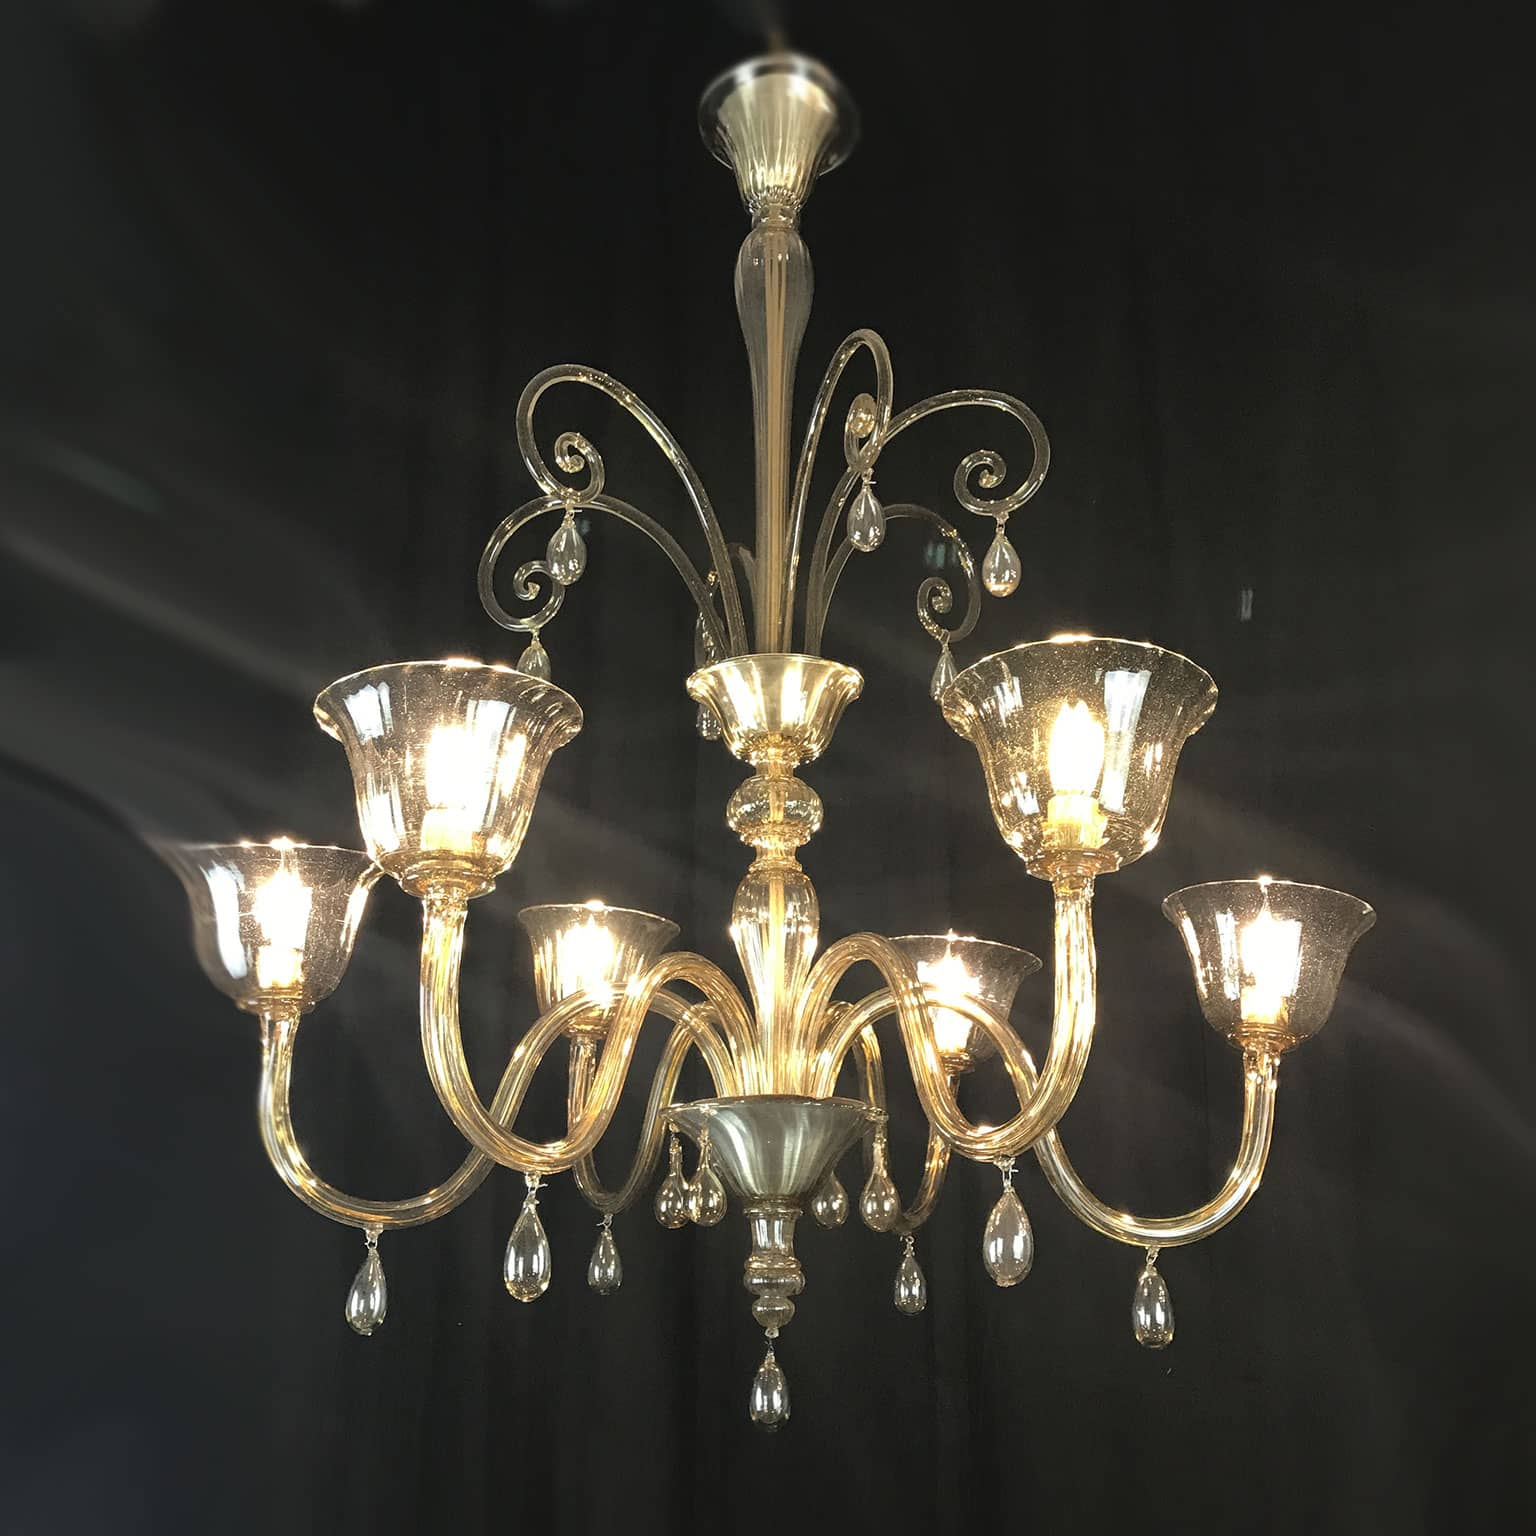 for design fabulous bulbs candelabra photos of edison inspirational bulb chandeliers led beautiful decorative com full chandelier size light